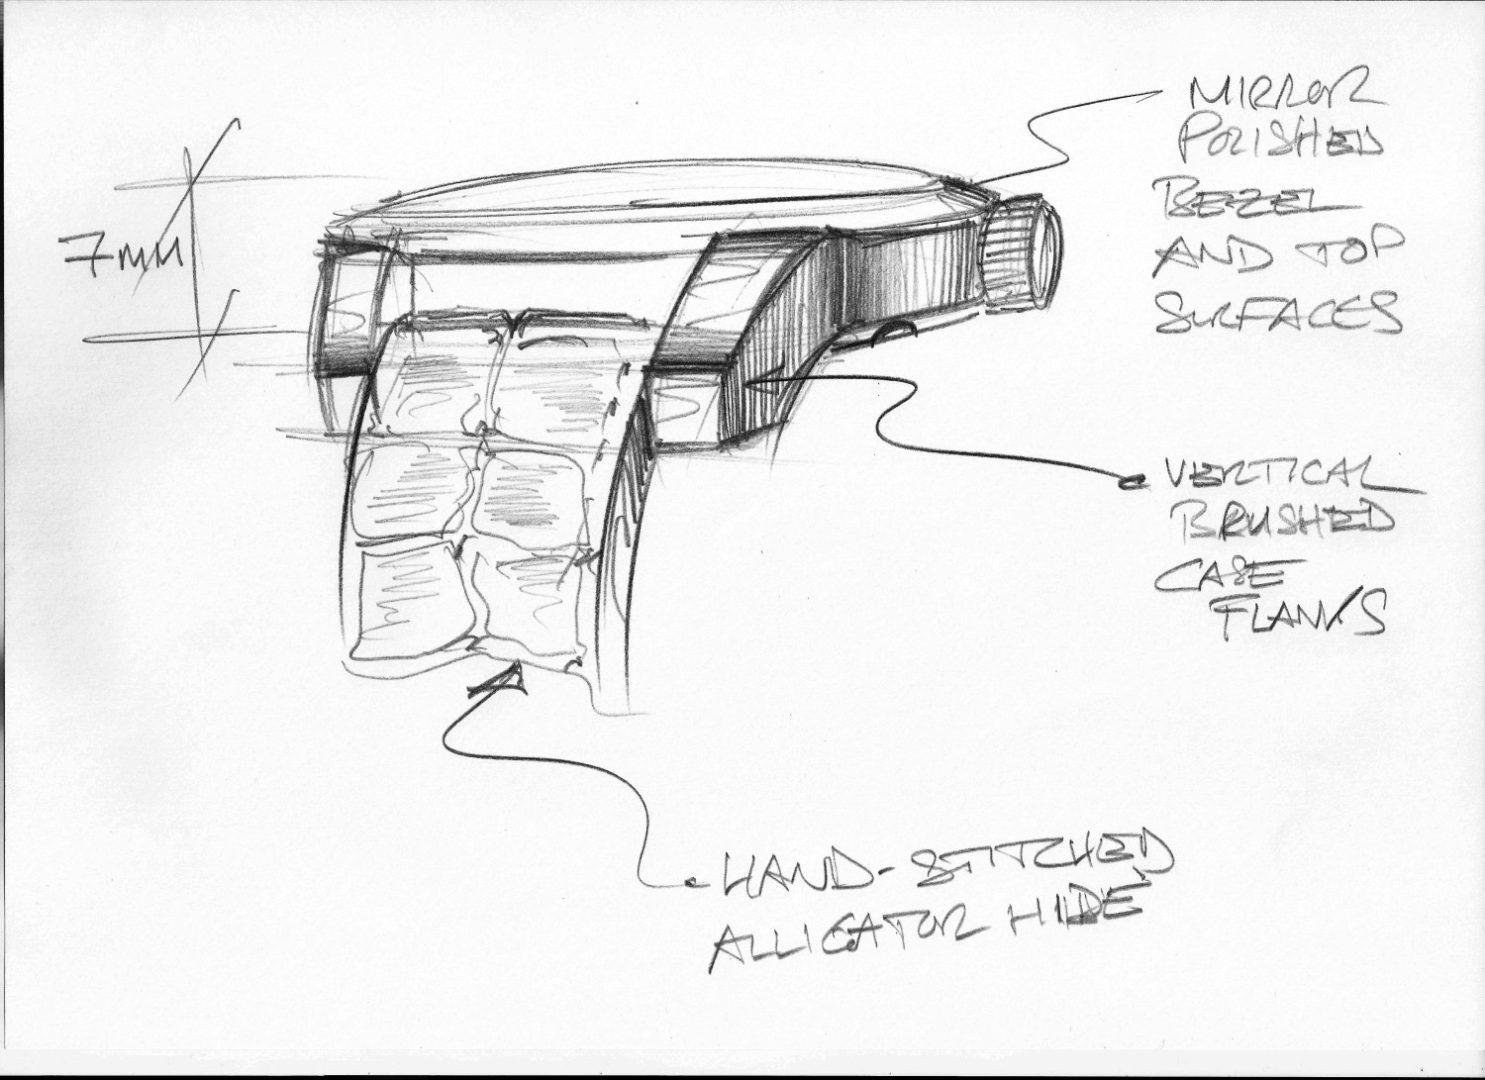 L.U.C XPS 1860 - Sketch 3 - Case details